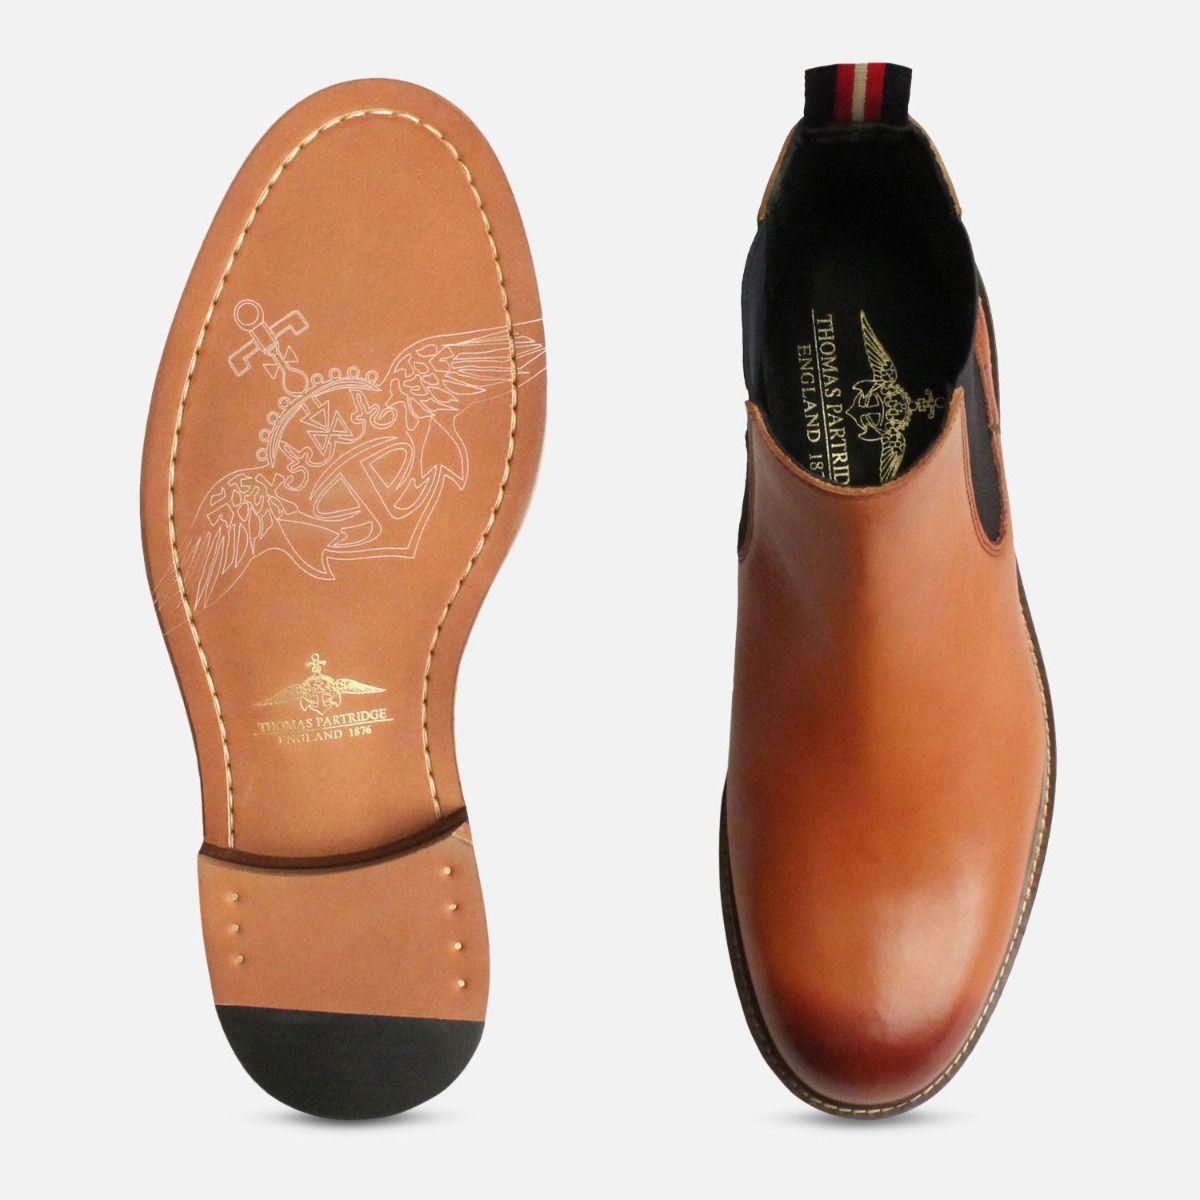 Thomas Partridge London Tan Cranwell Chelsea Boots